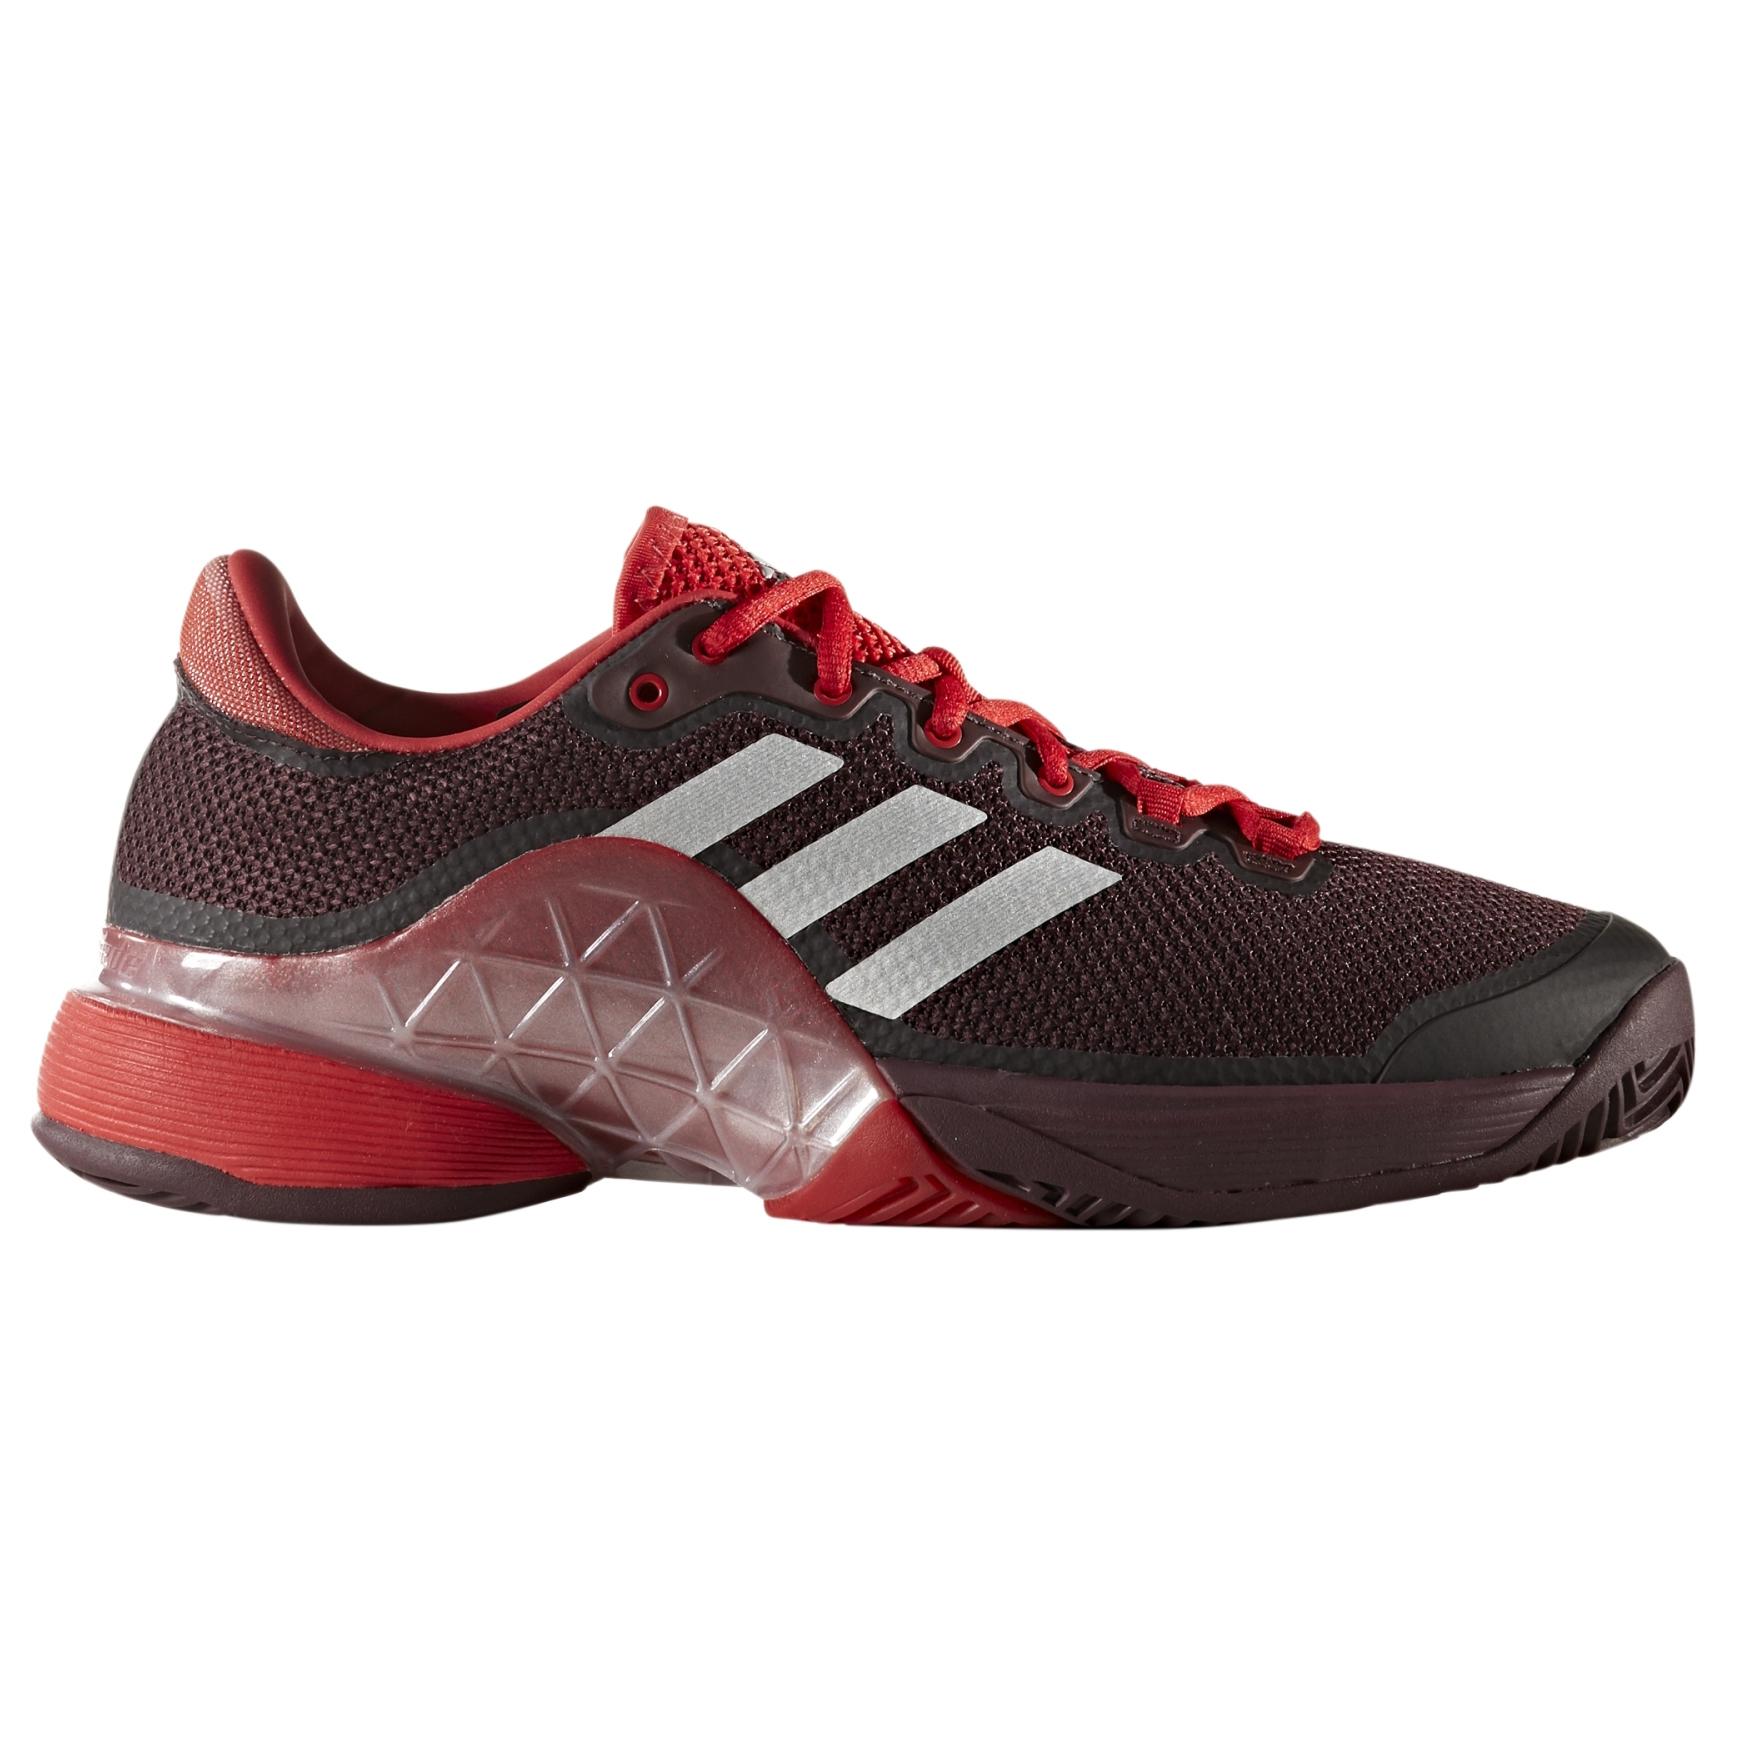 adidas Barricade 2017 Men's Tennis Shoe - Burgundy